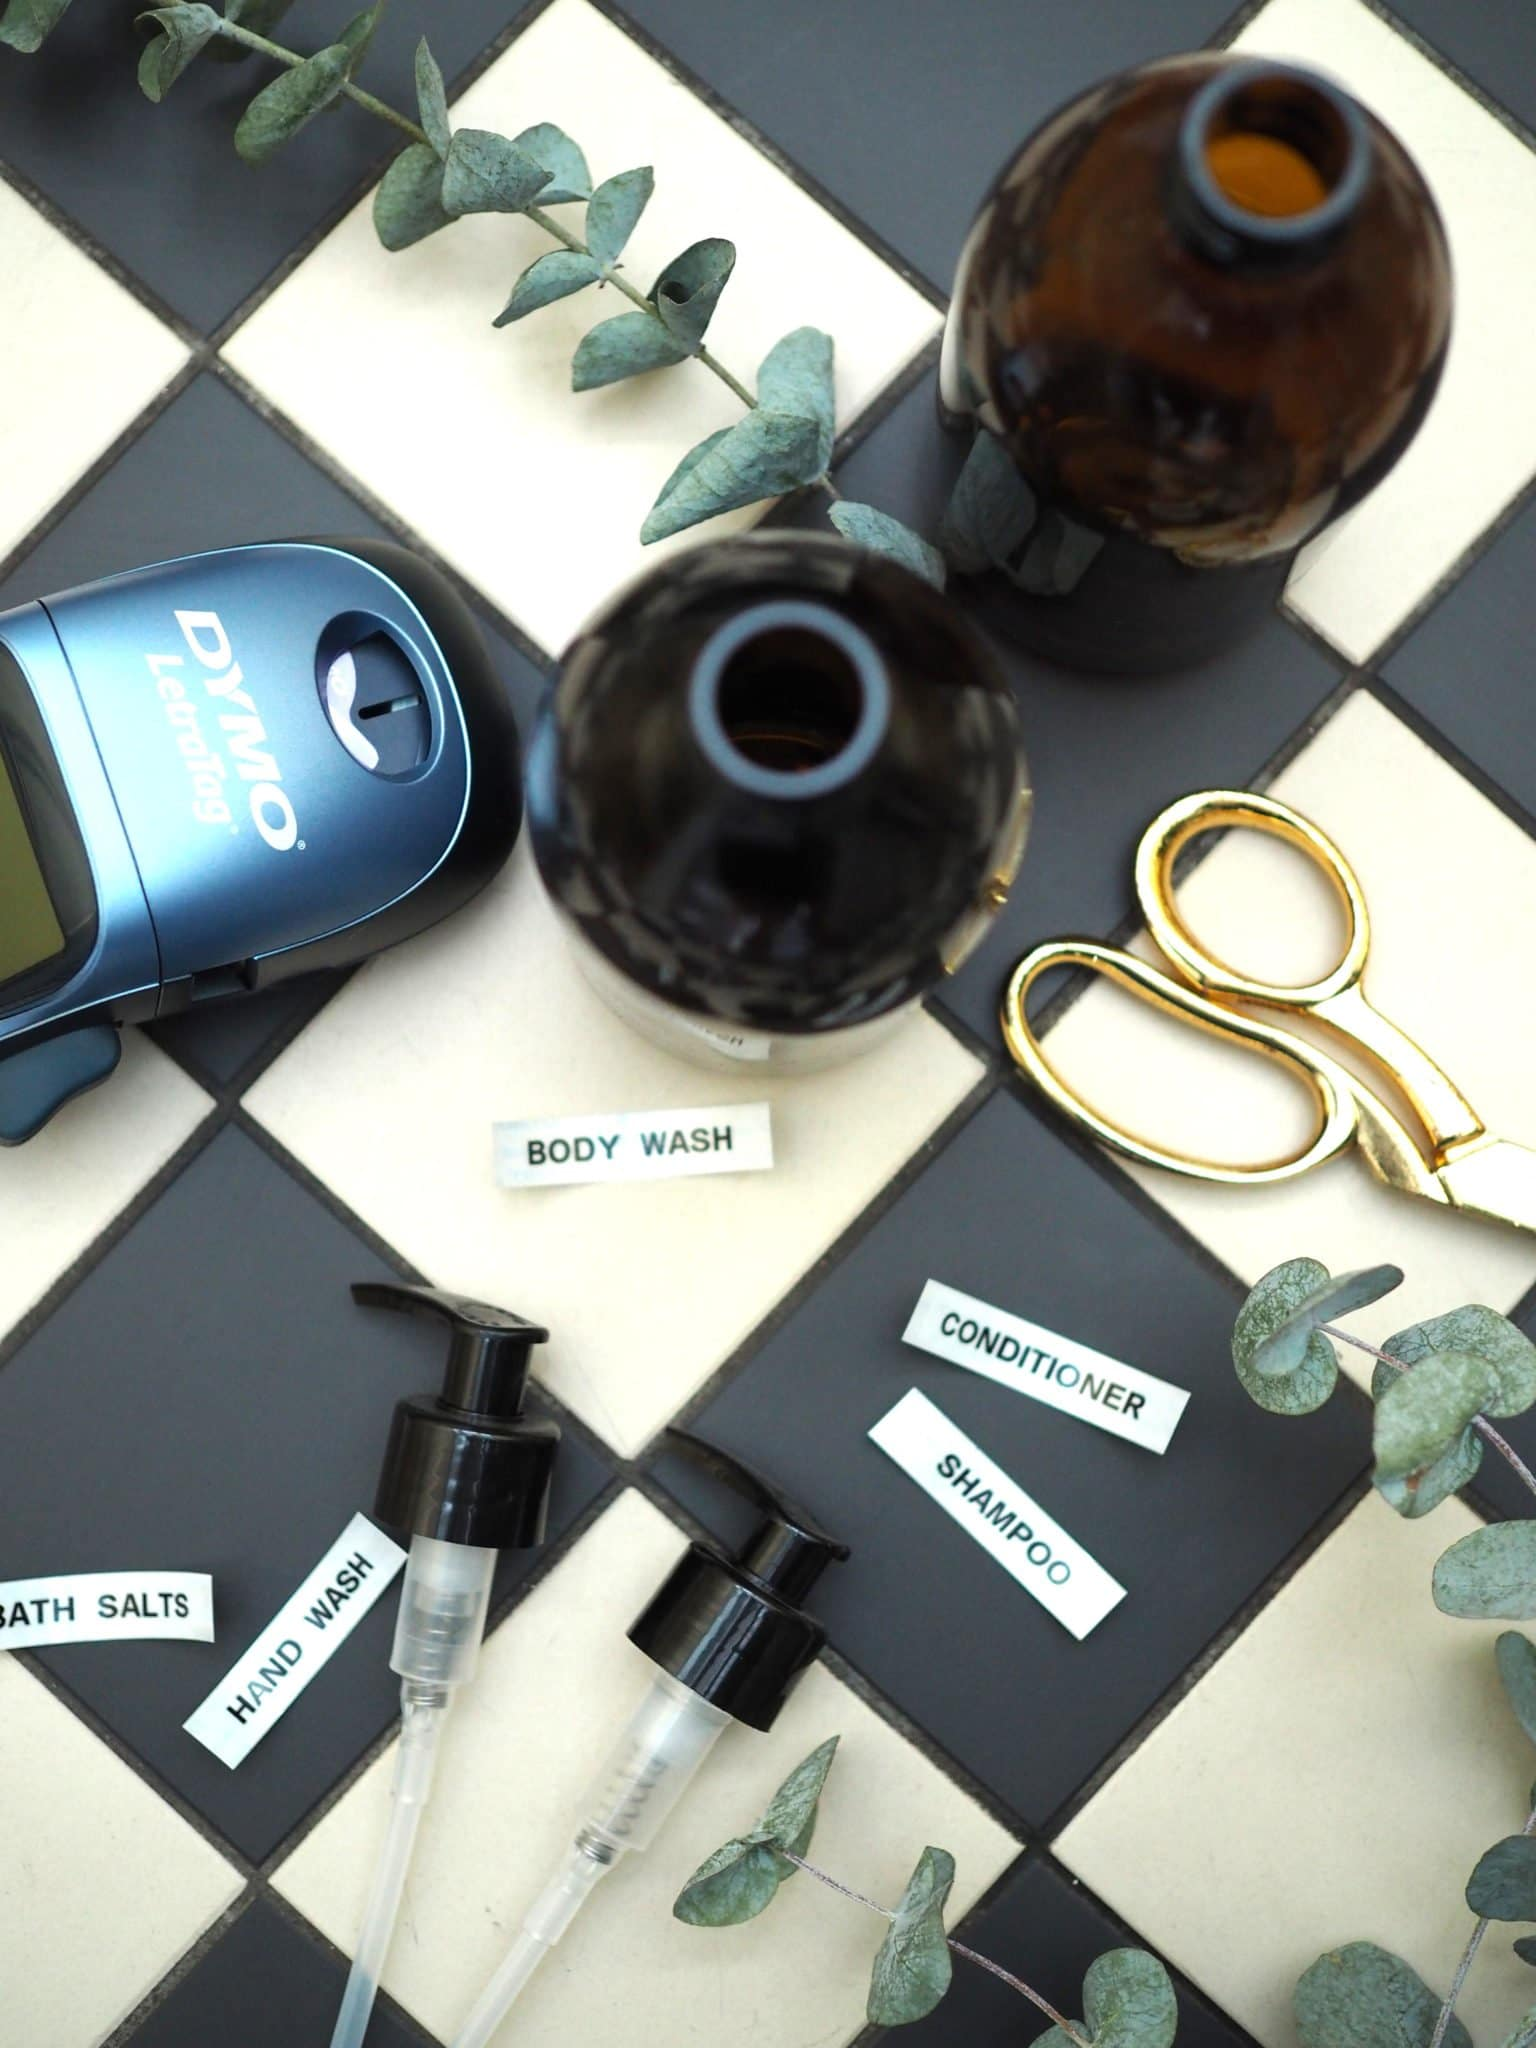 DIY Amber Shampoo Bottles